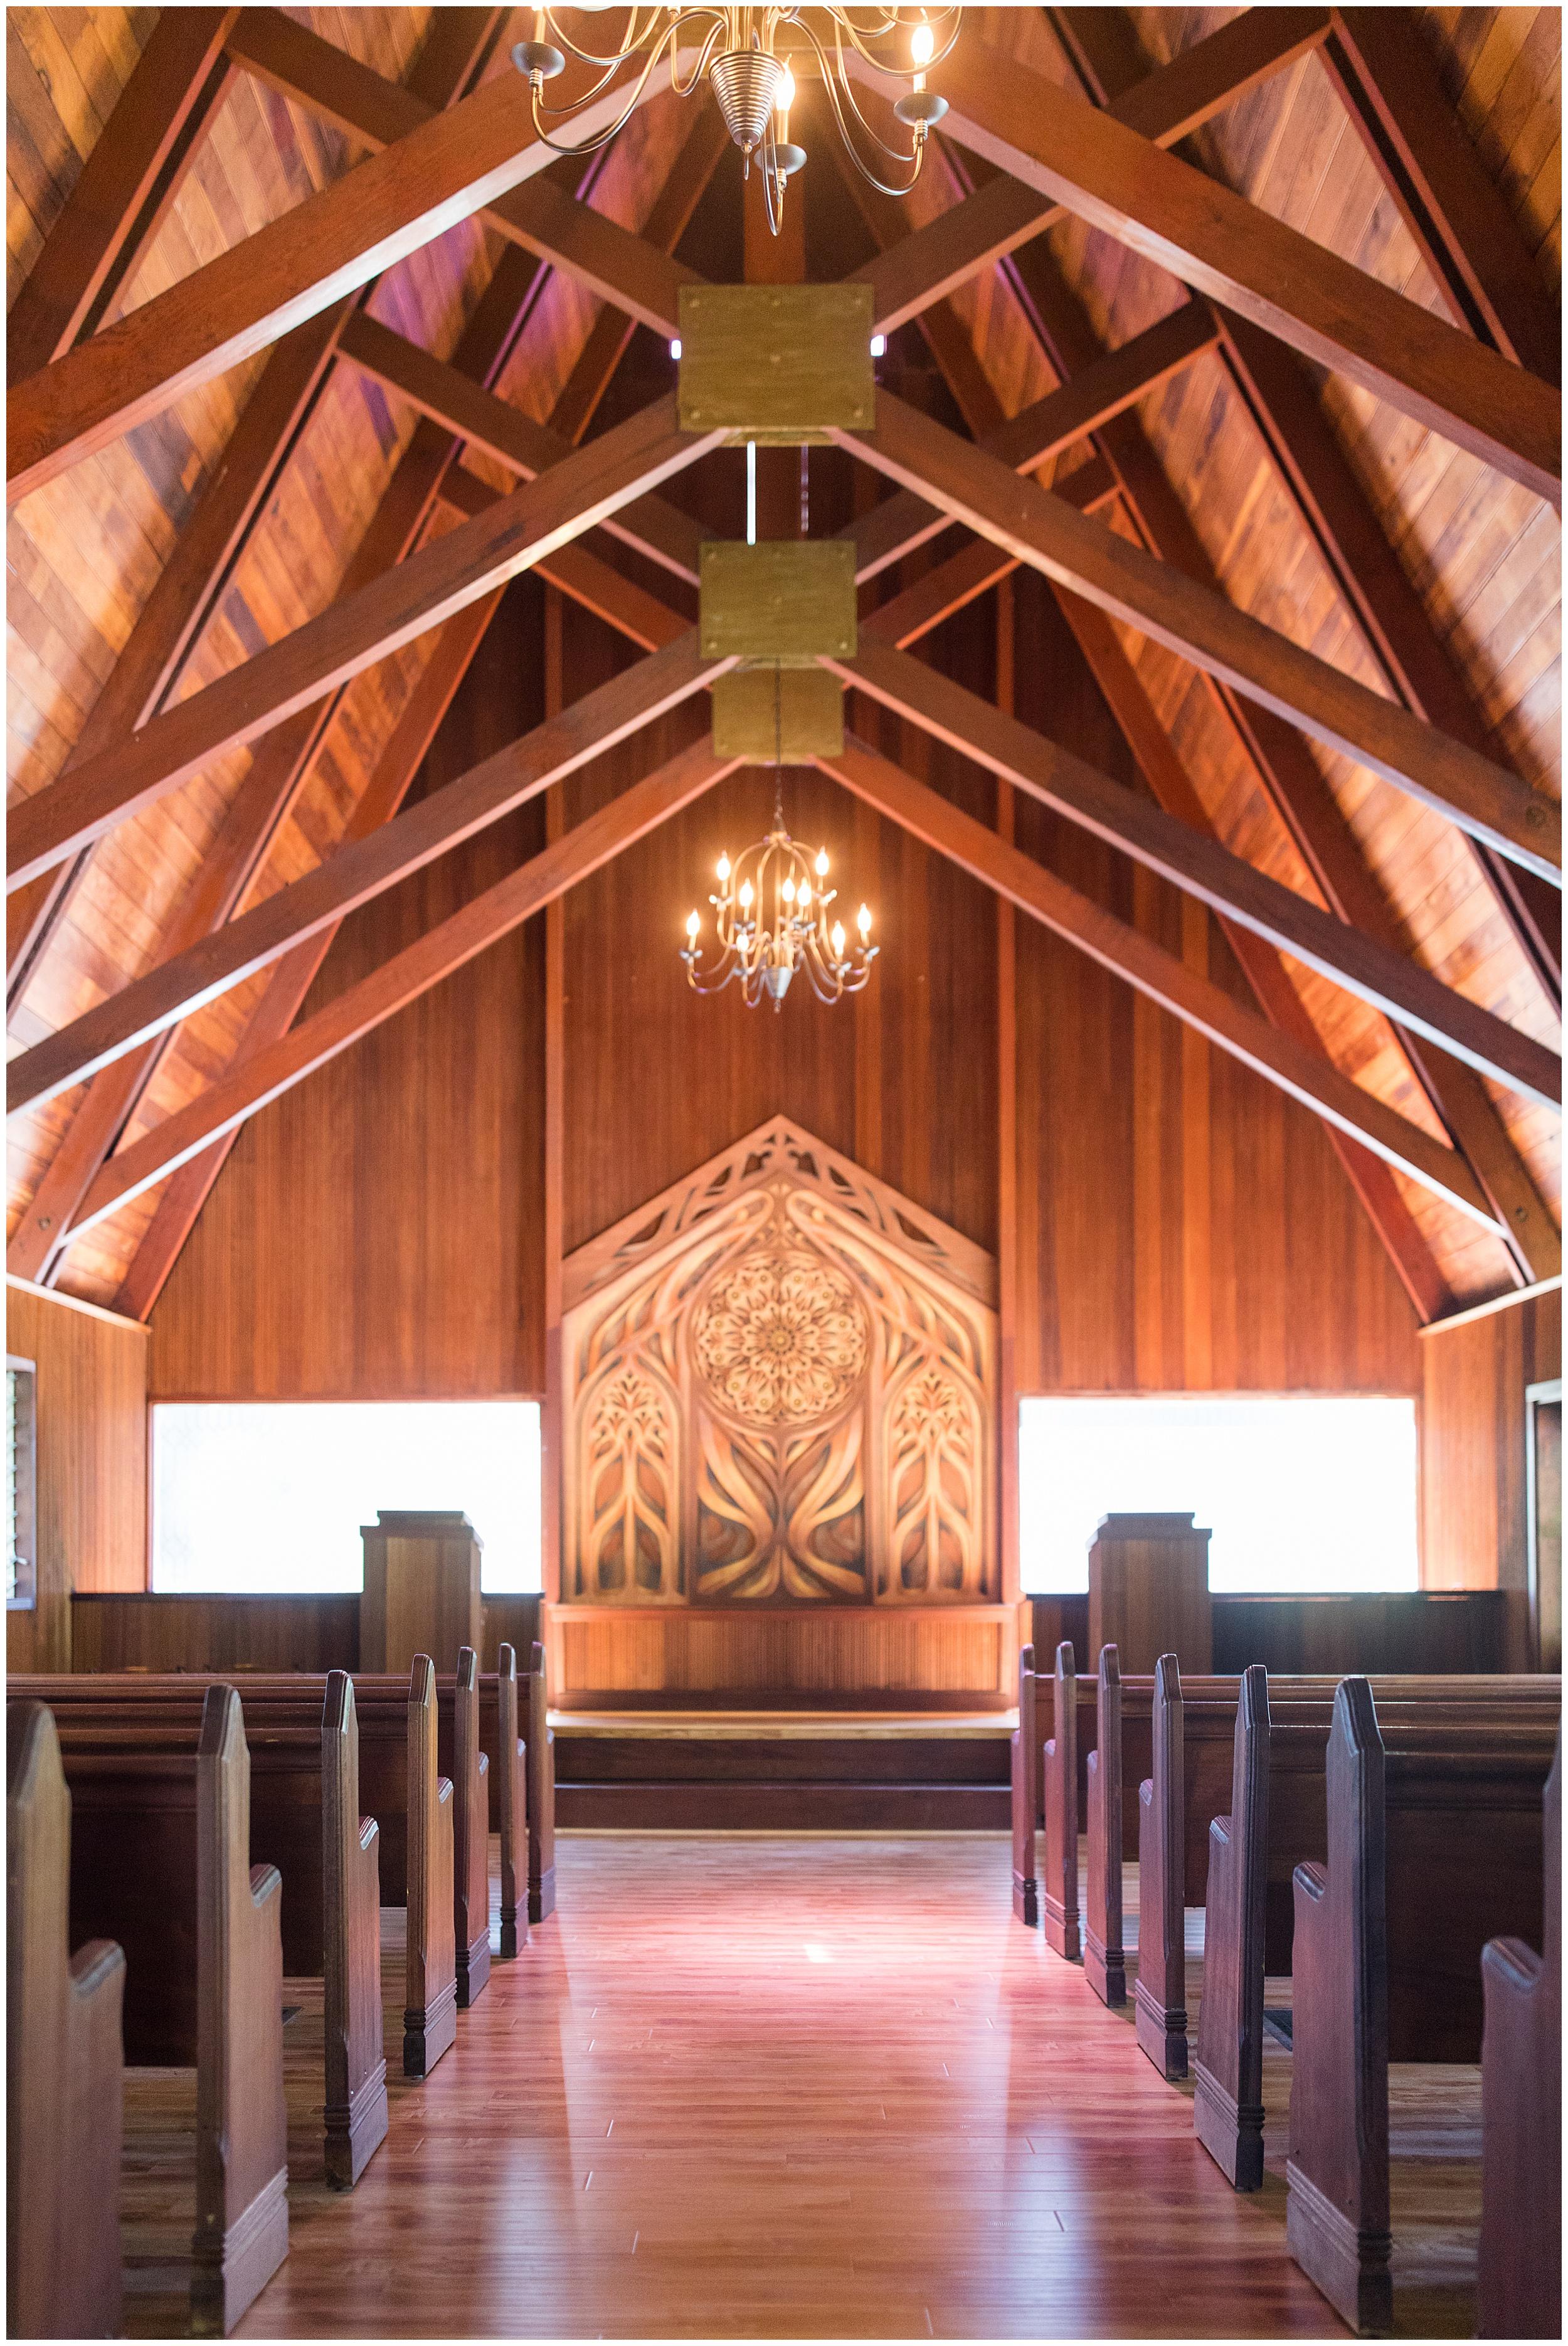 2019 chapel on the hill los gatos san jose bay area wedding photographer angela sue photography_0007.jpg